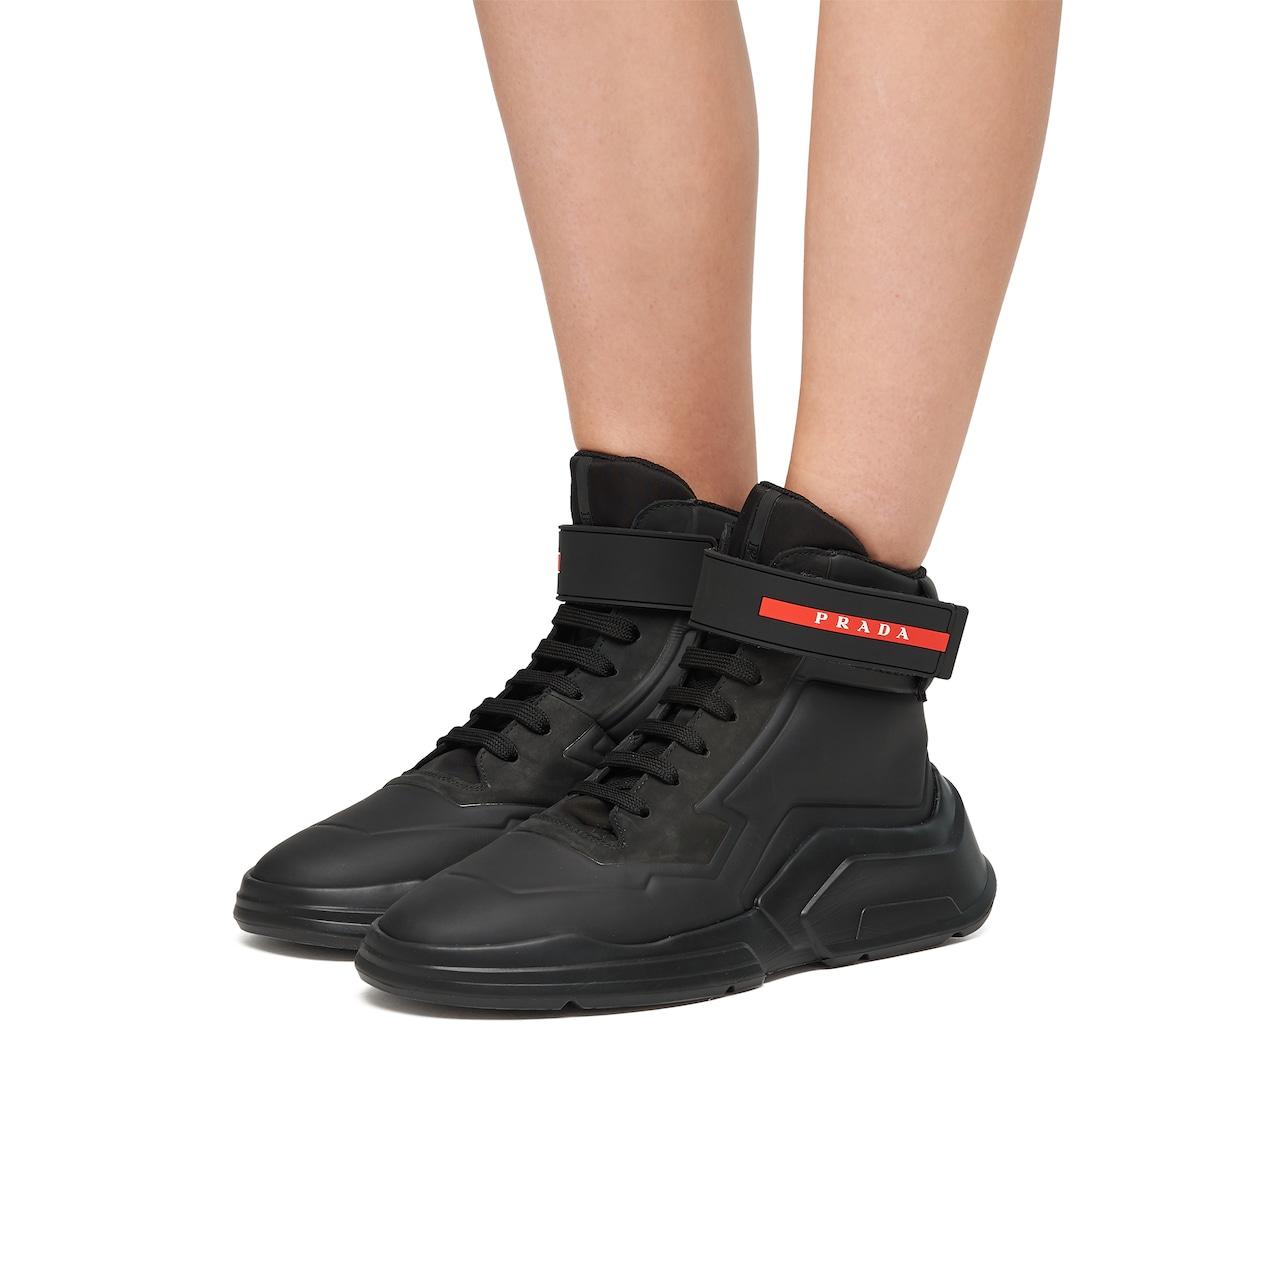 Prada Prada Polarius 19 LR sneakers 3